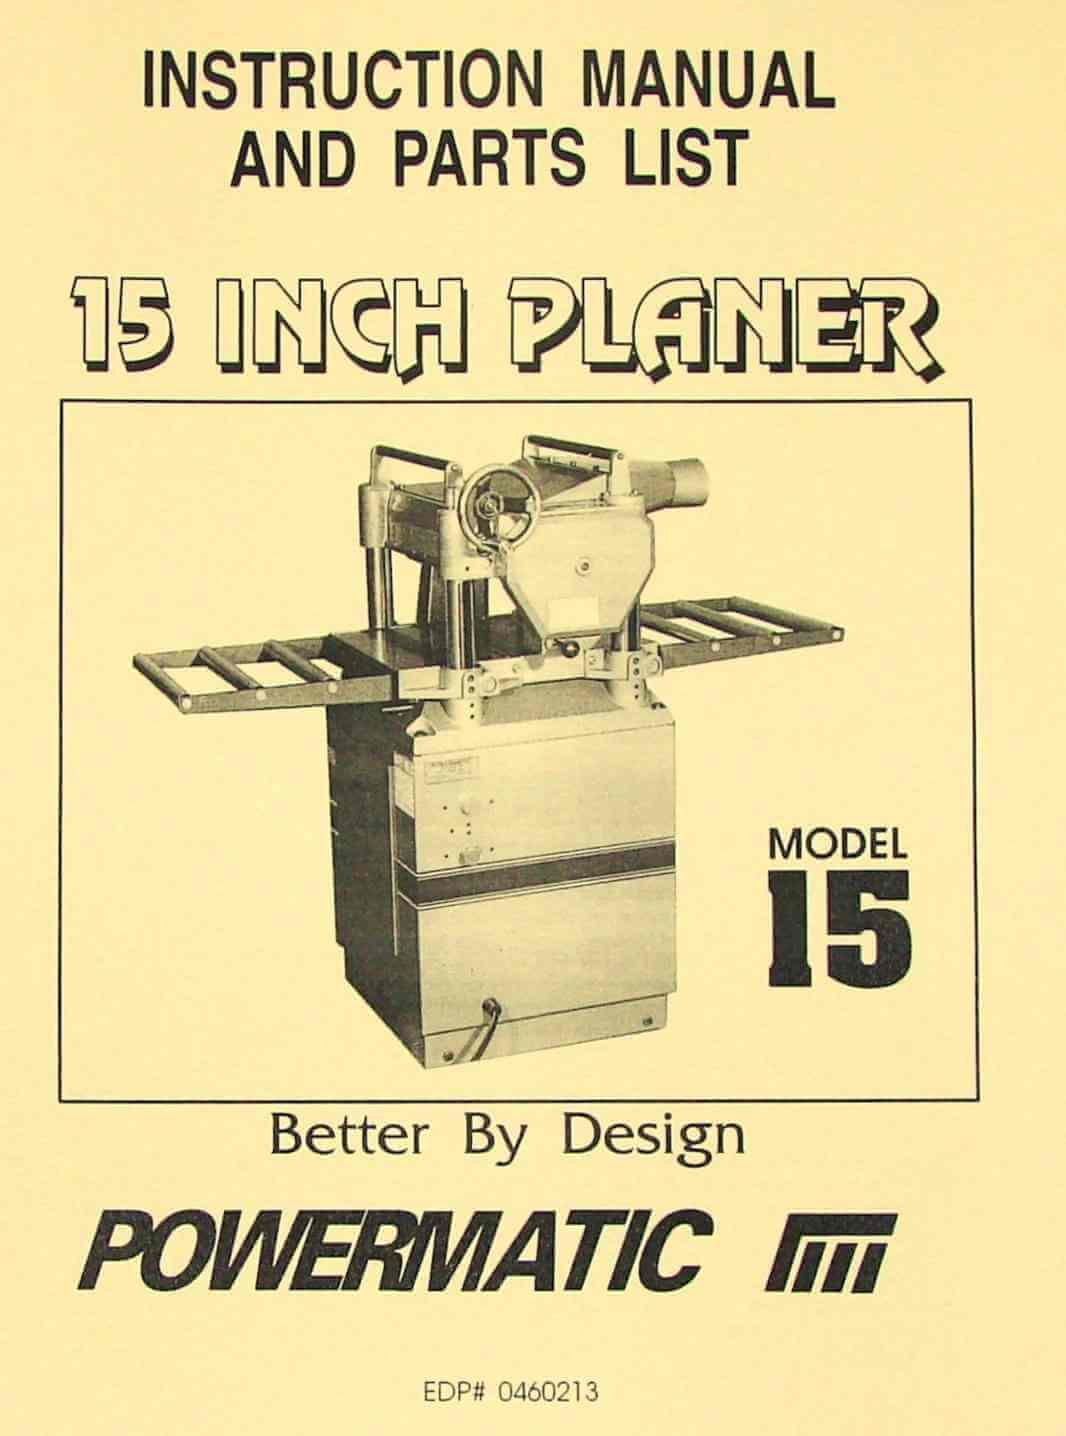 POWERMATIC Model 15 Wood Planer Instructions and Parts Manual | Ozark Tool Manuals & Books